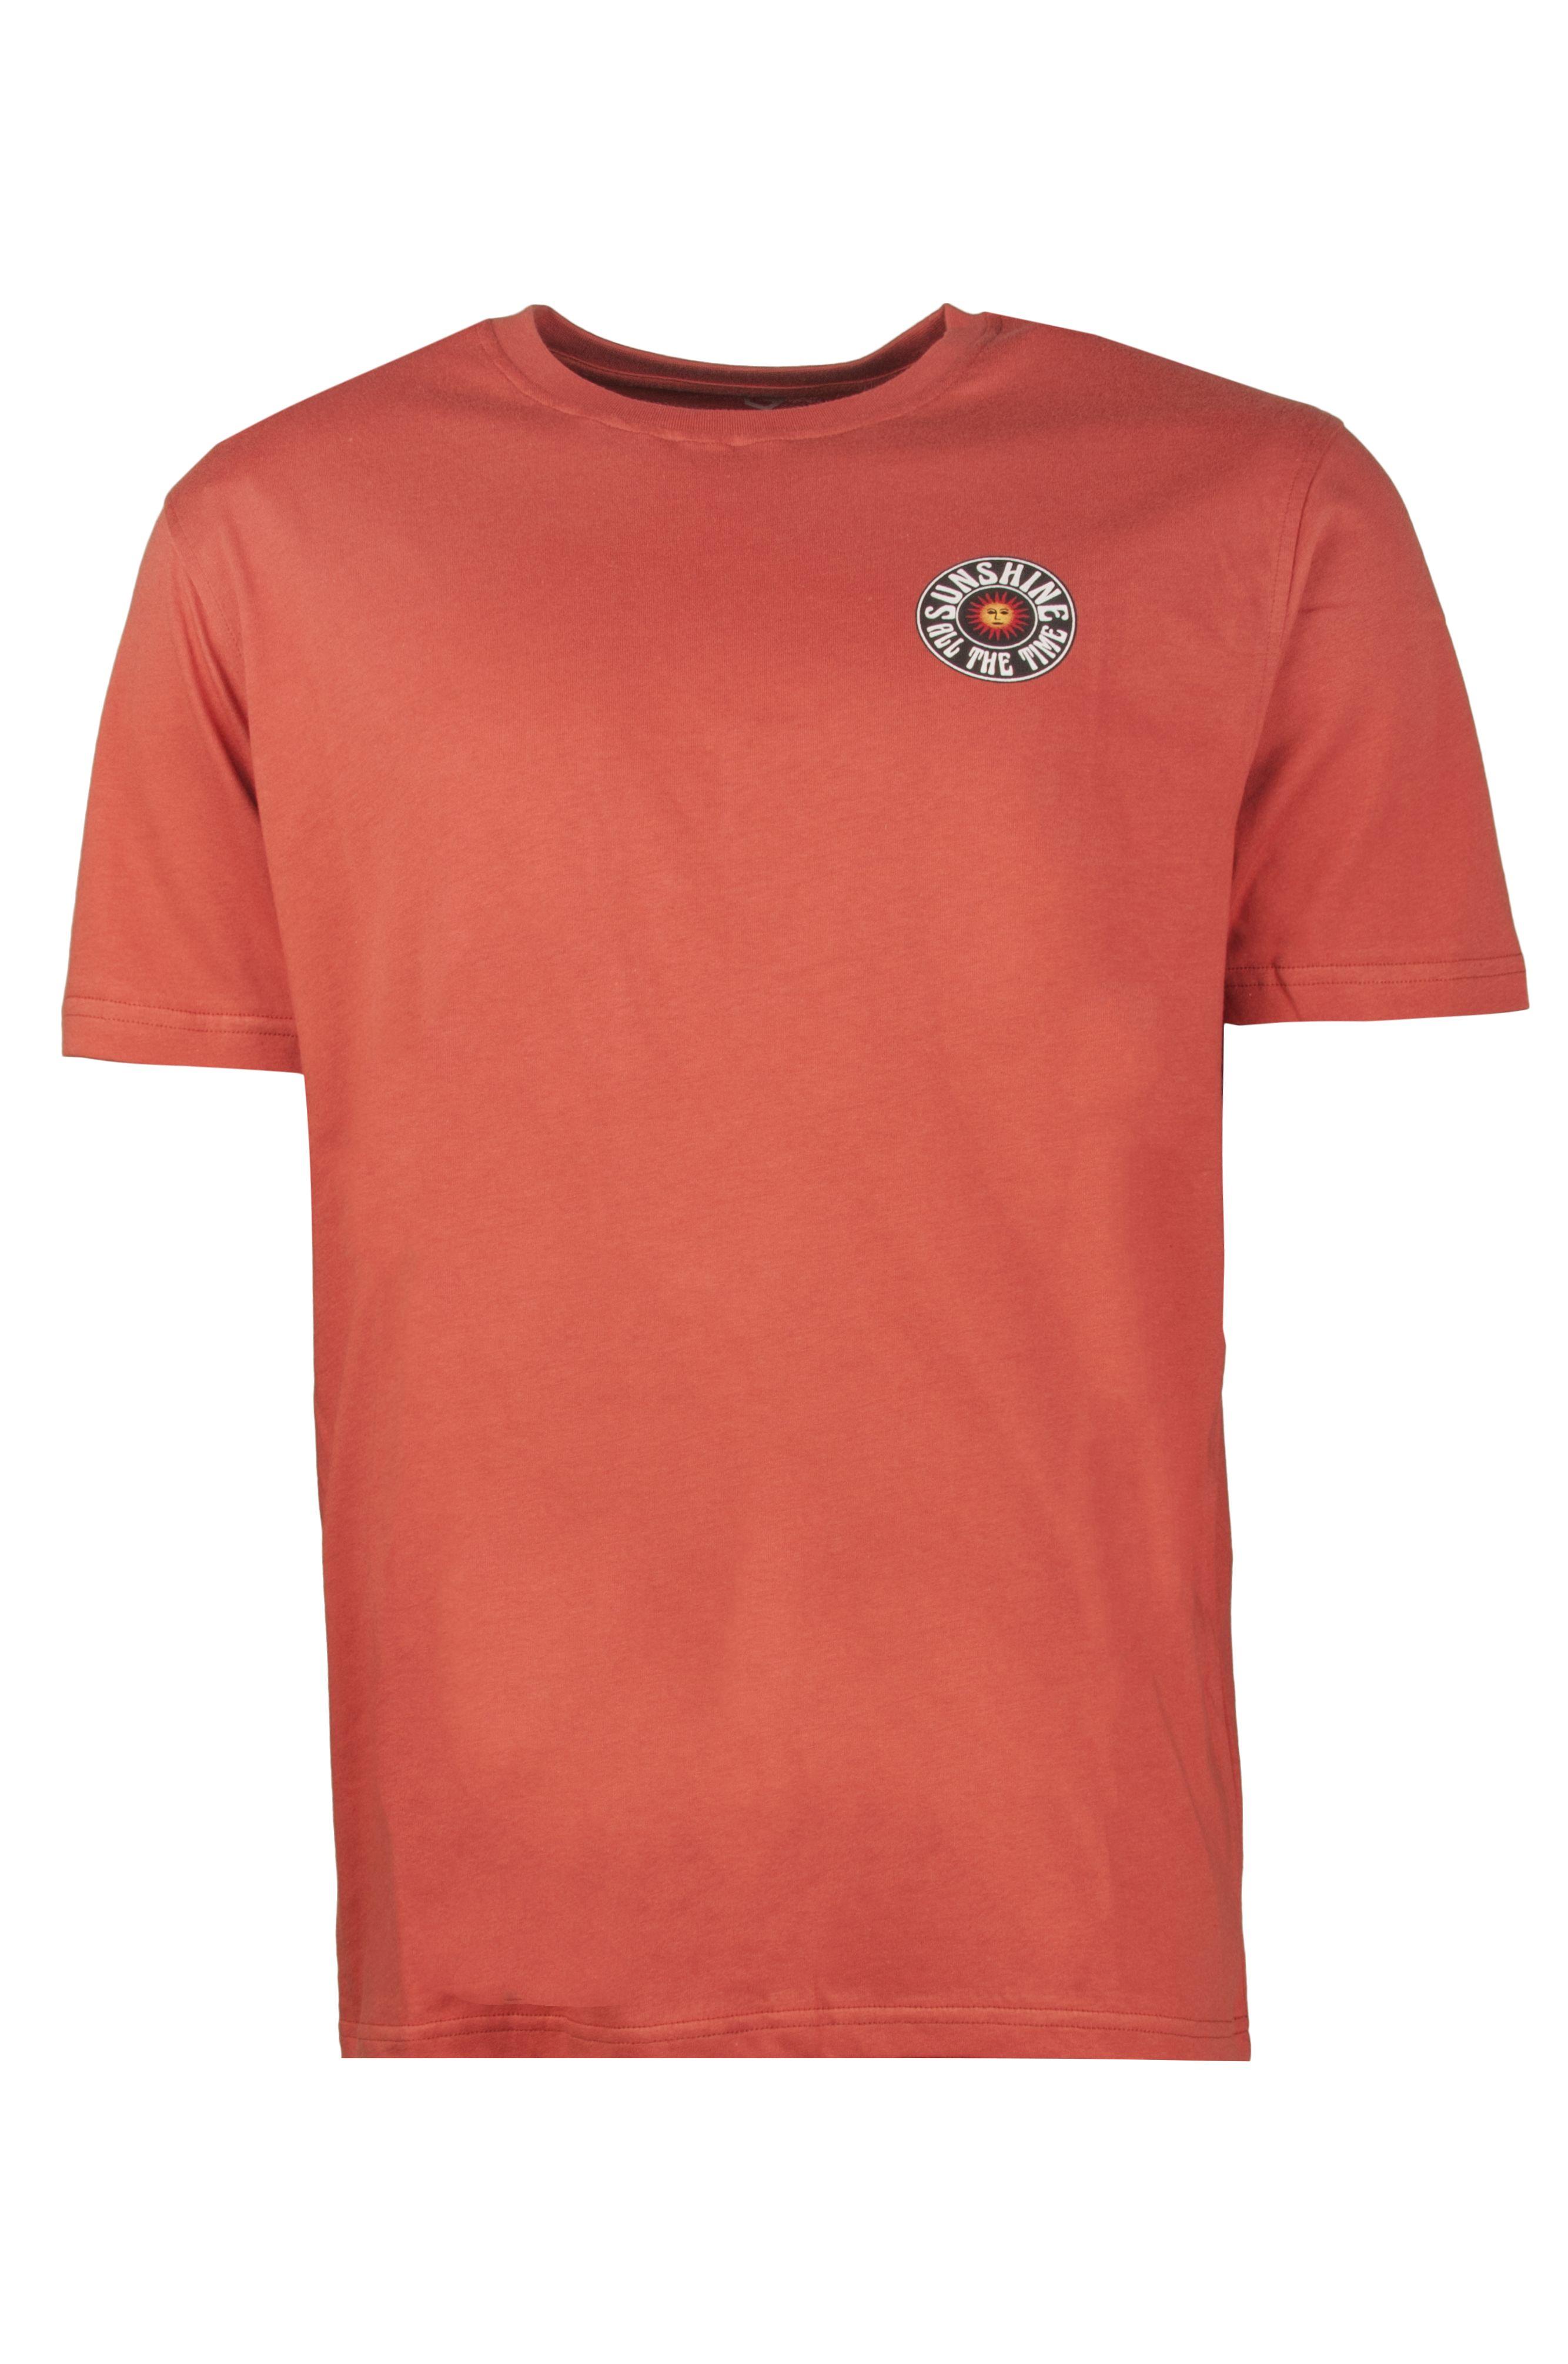 Ericeira Surf Skate T-Shirt SUN SMILE Blood